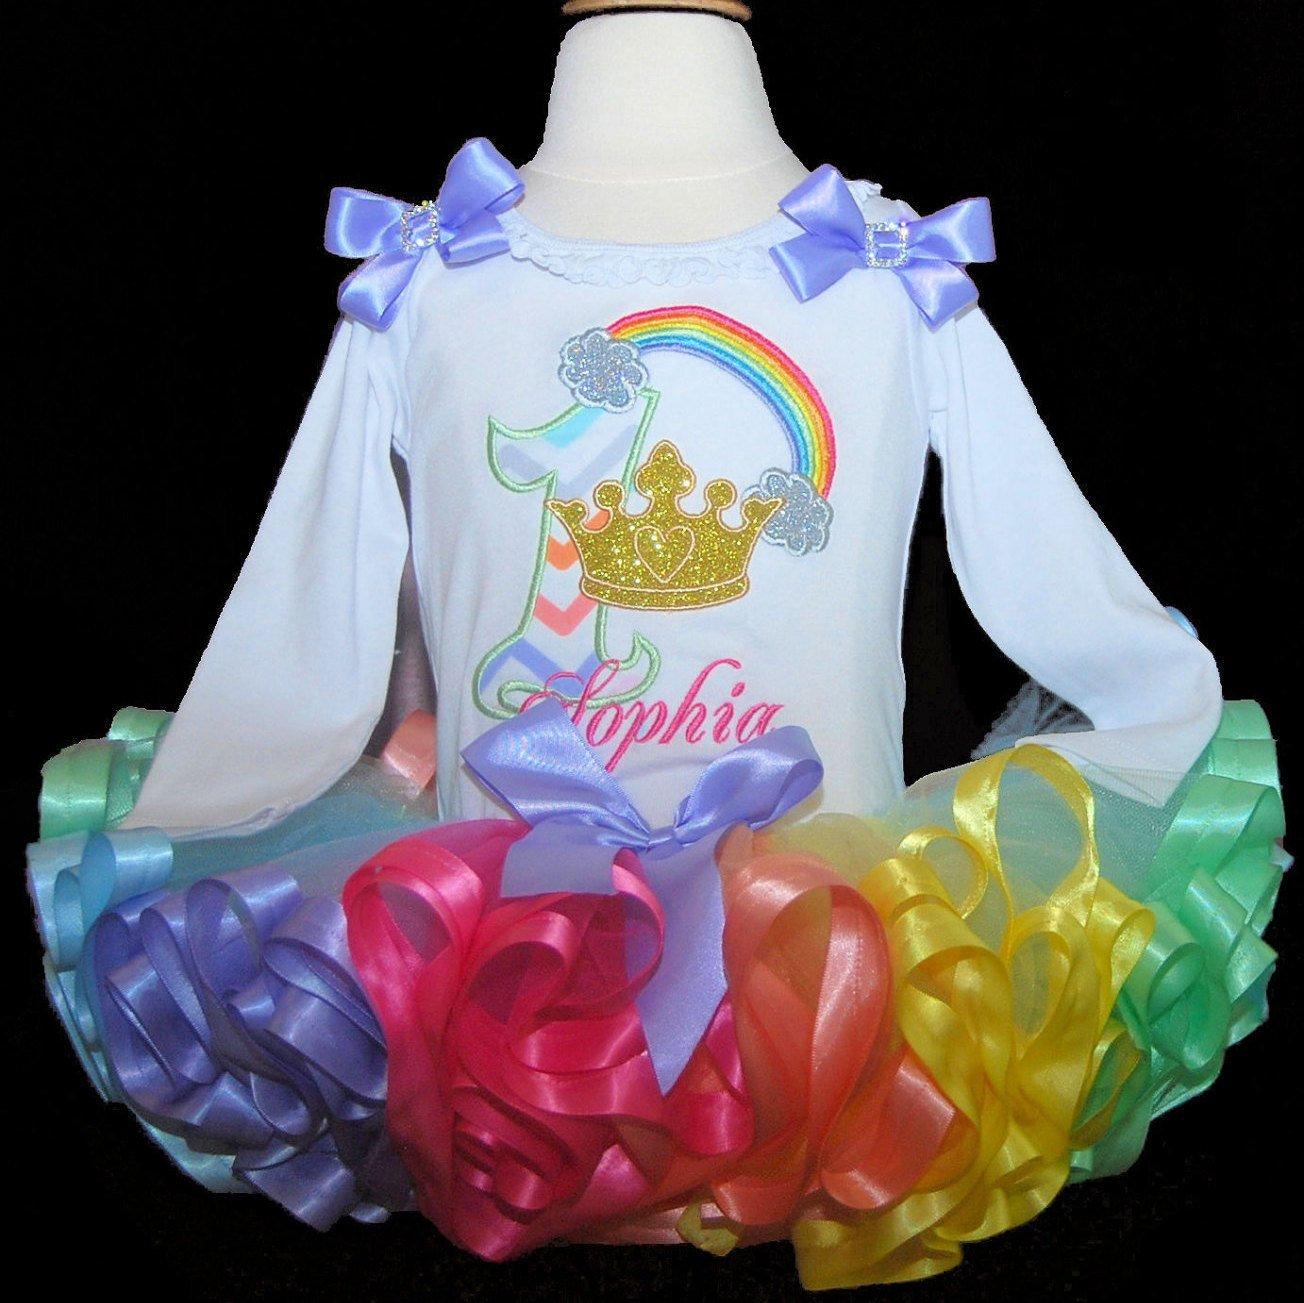 1st birthday outfit Princess Rainbow Tutu set, 1st Birthday girl outfit, gold glitter crown, princess tutu dress, custom made birthday dress